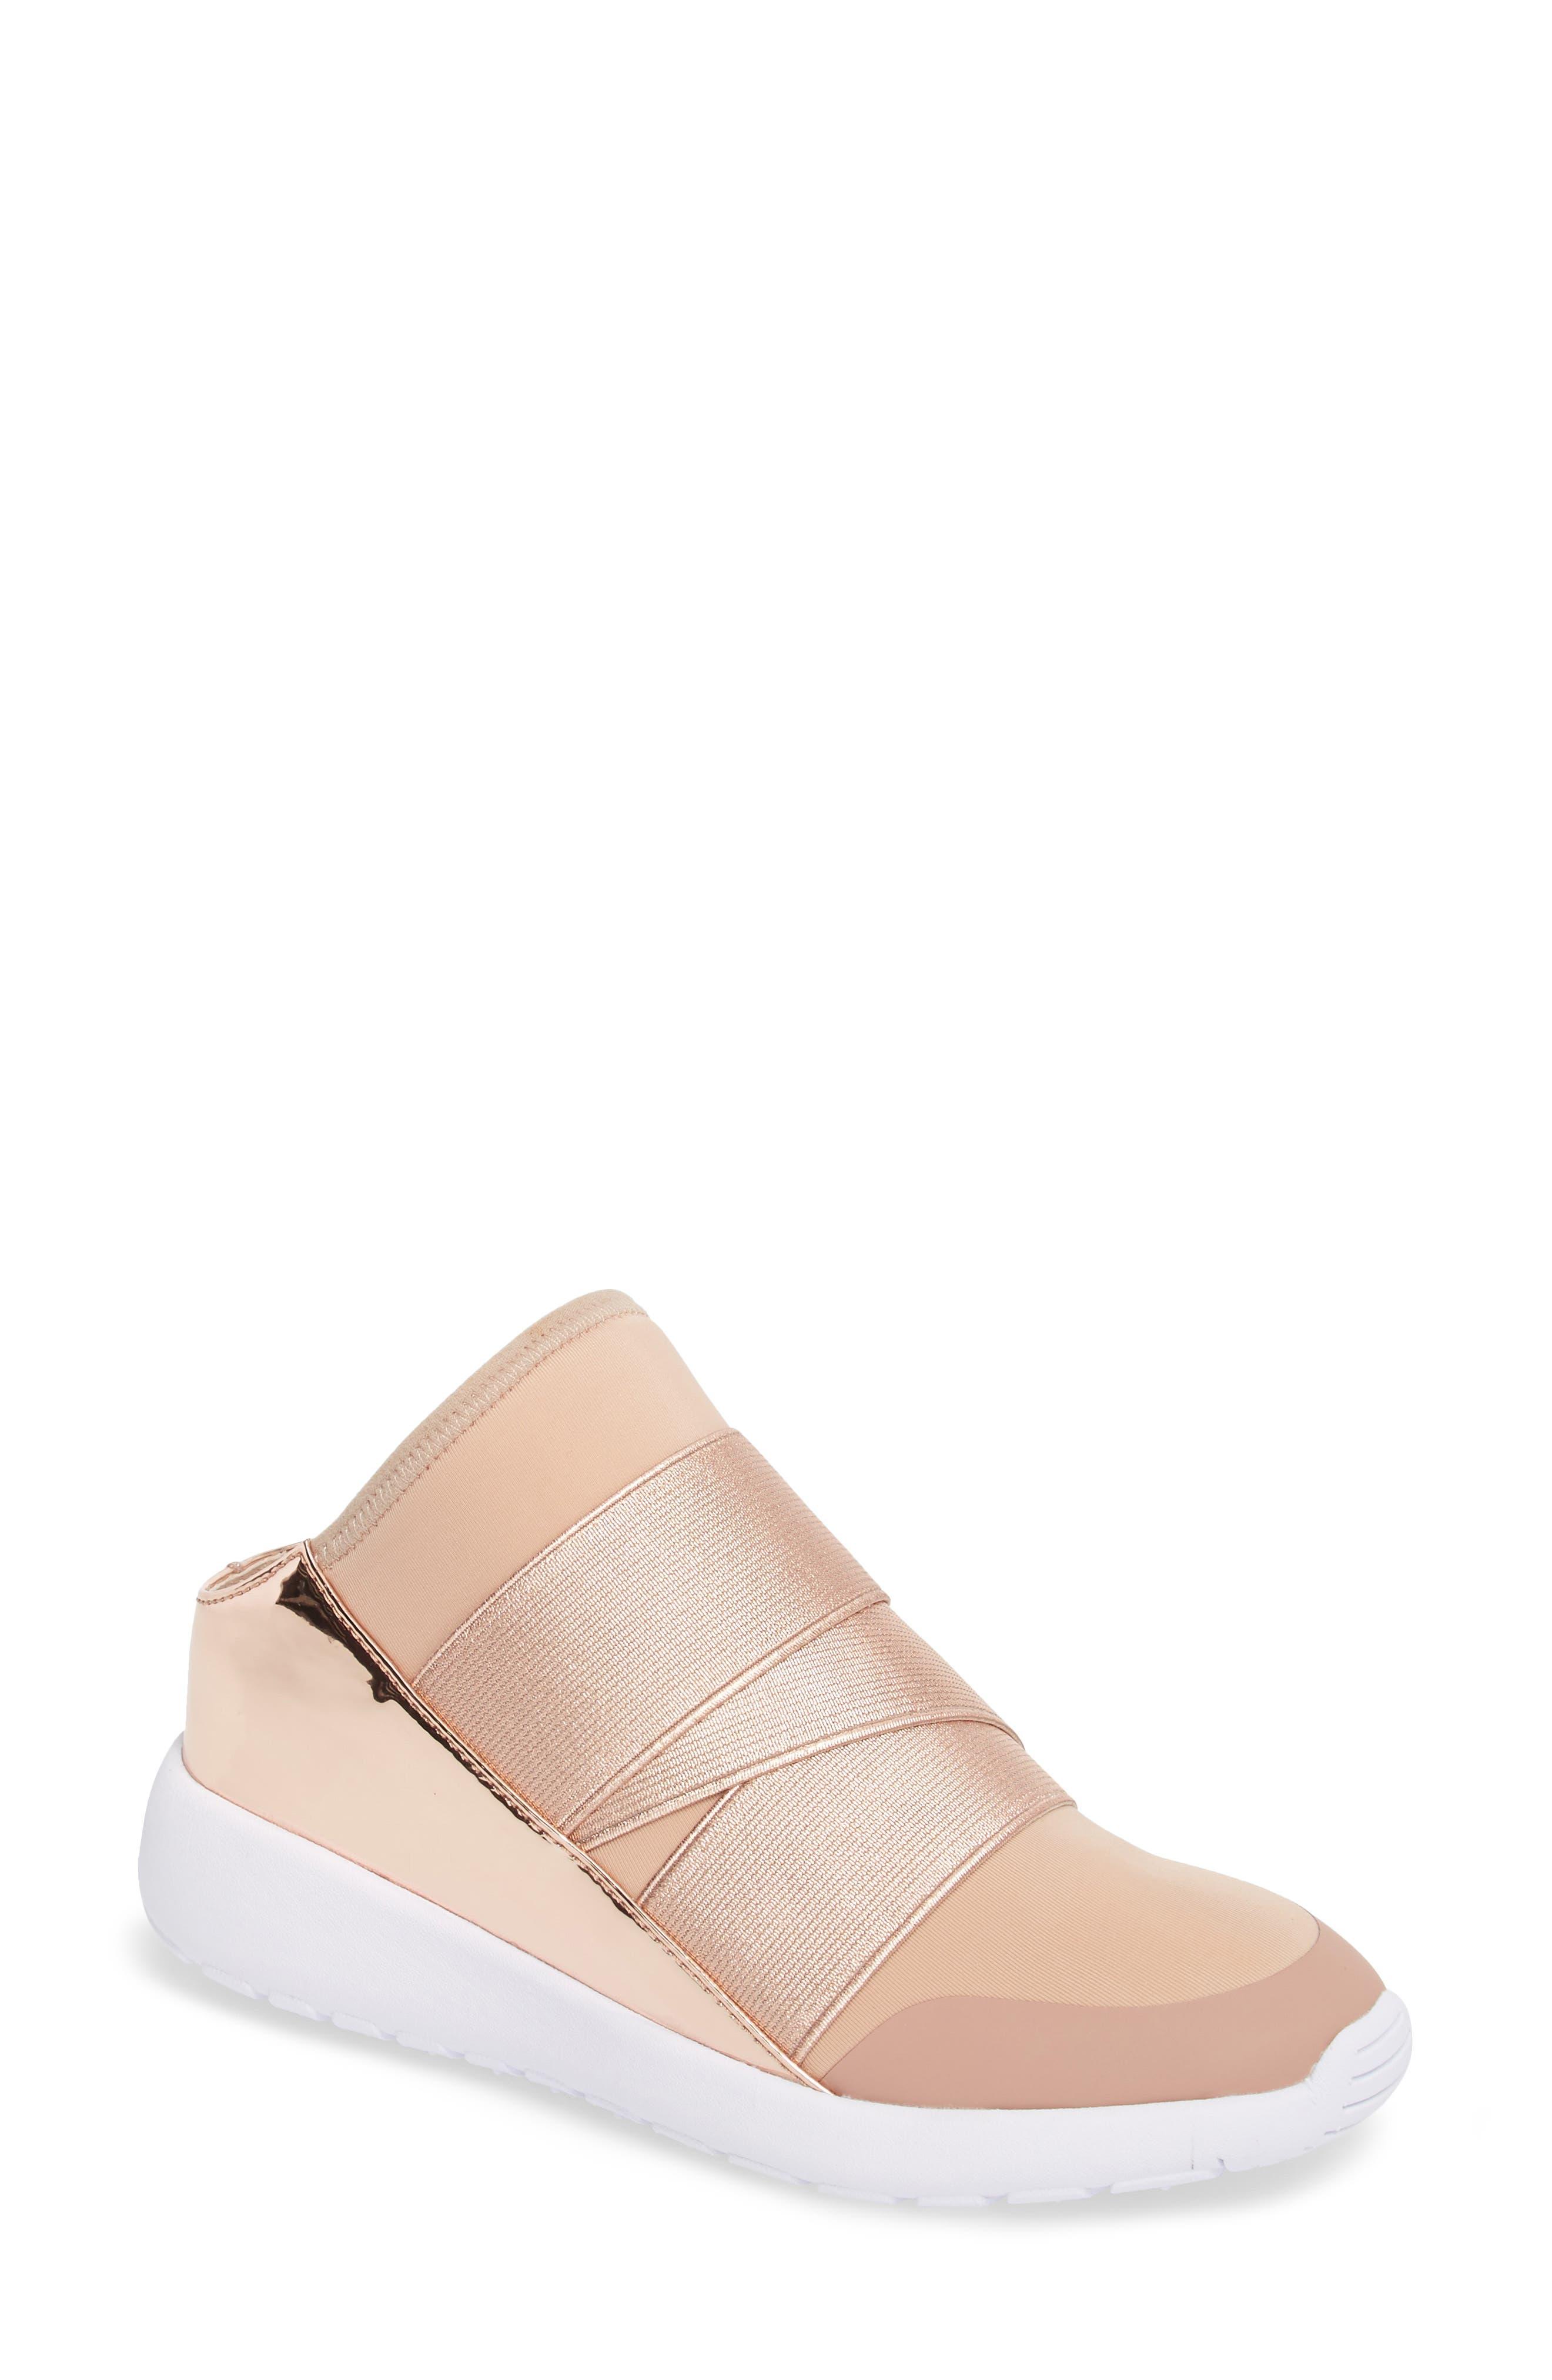 Vine Slip-On Sneaker,                             Main thumbnail 1, color,                             Blush